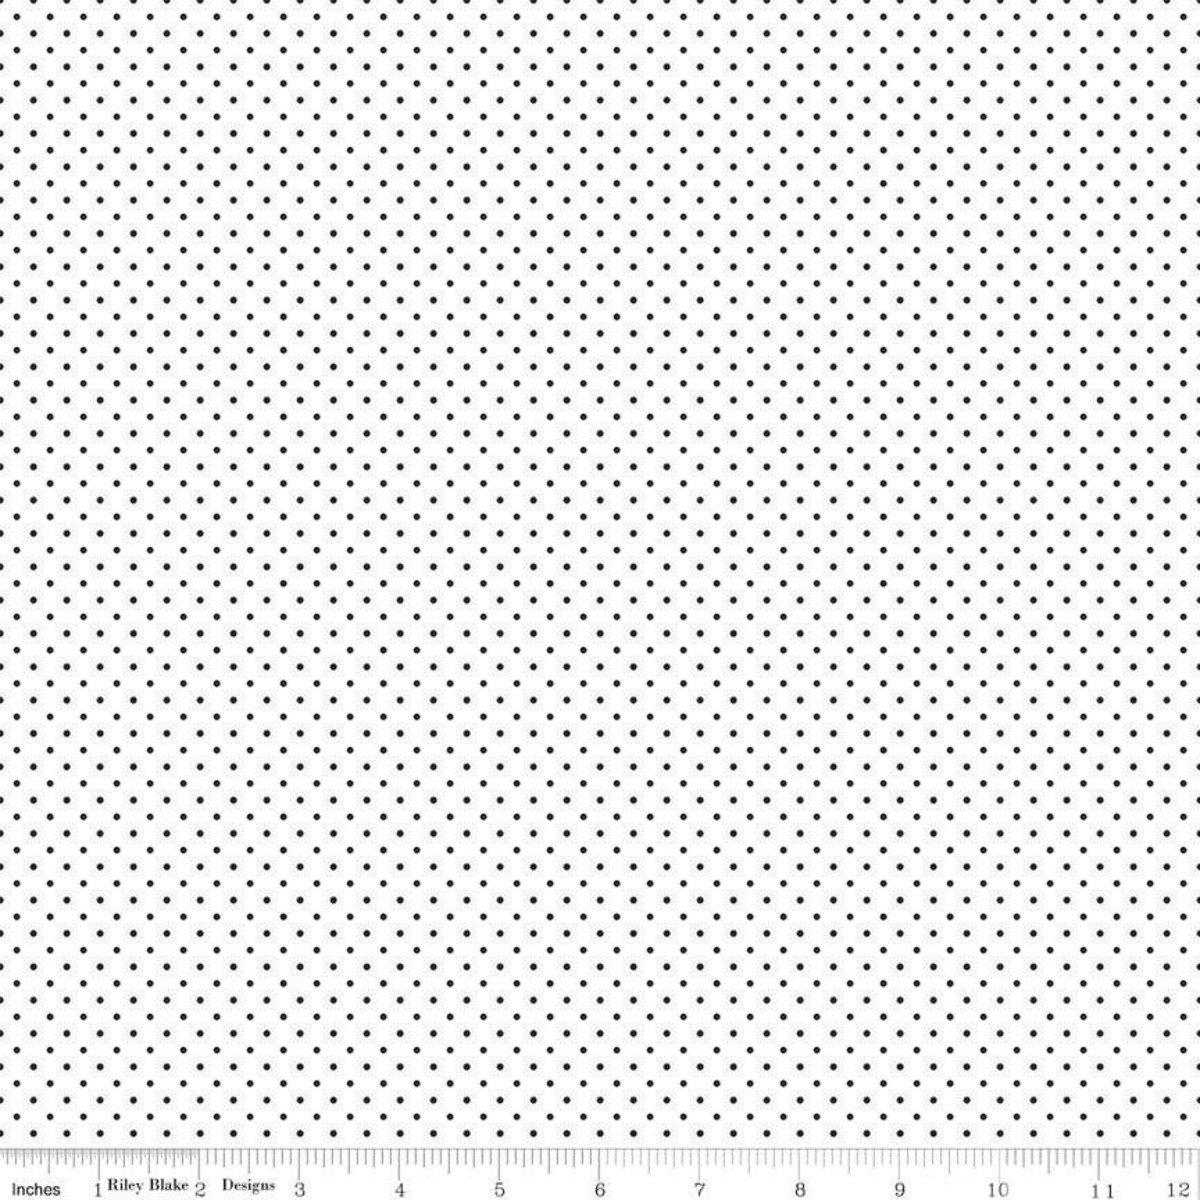 Riley Blake Designs, Swiss Dot - Swiss Dot Black on White